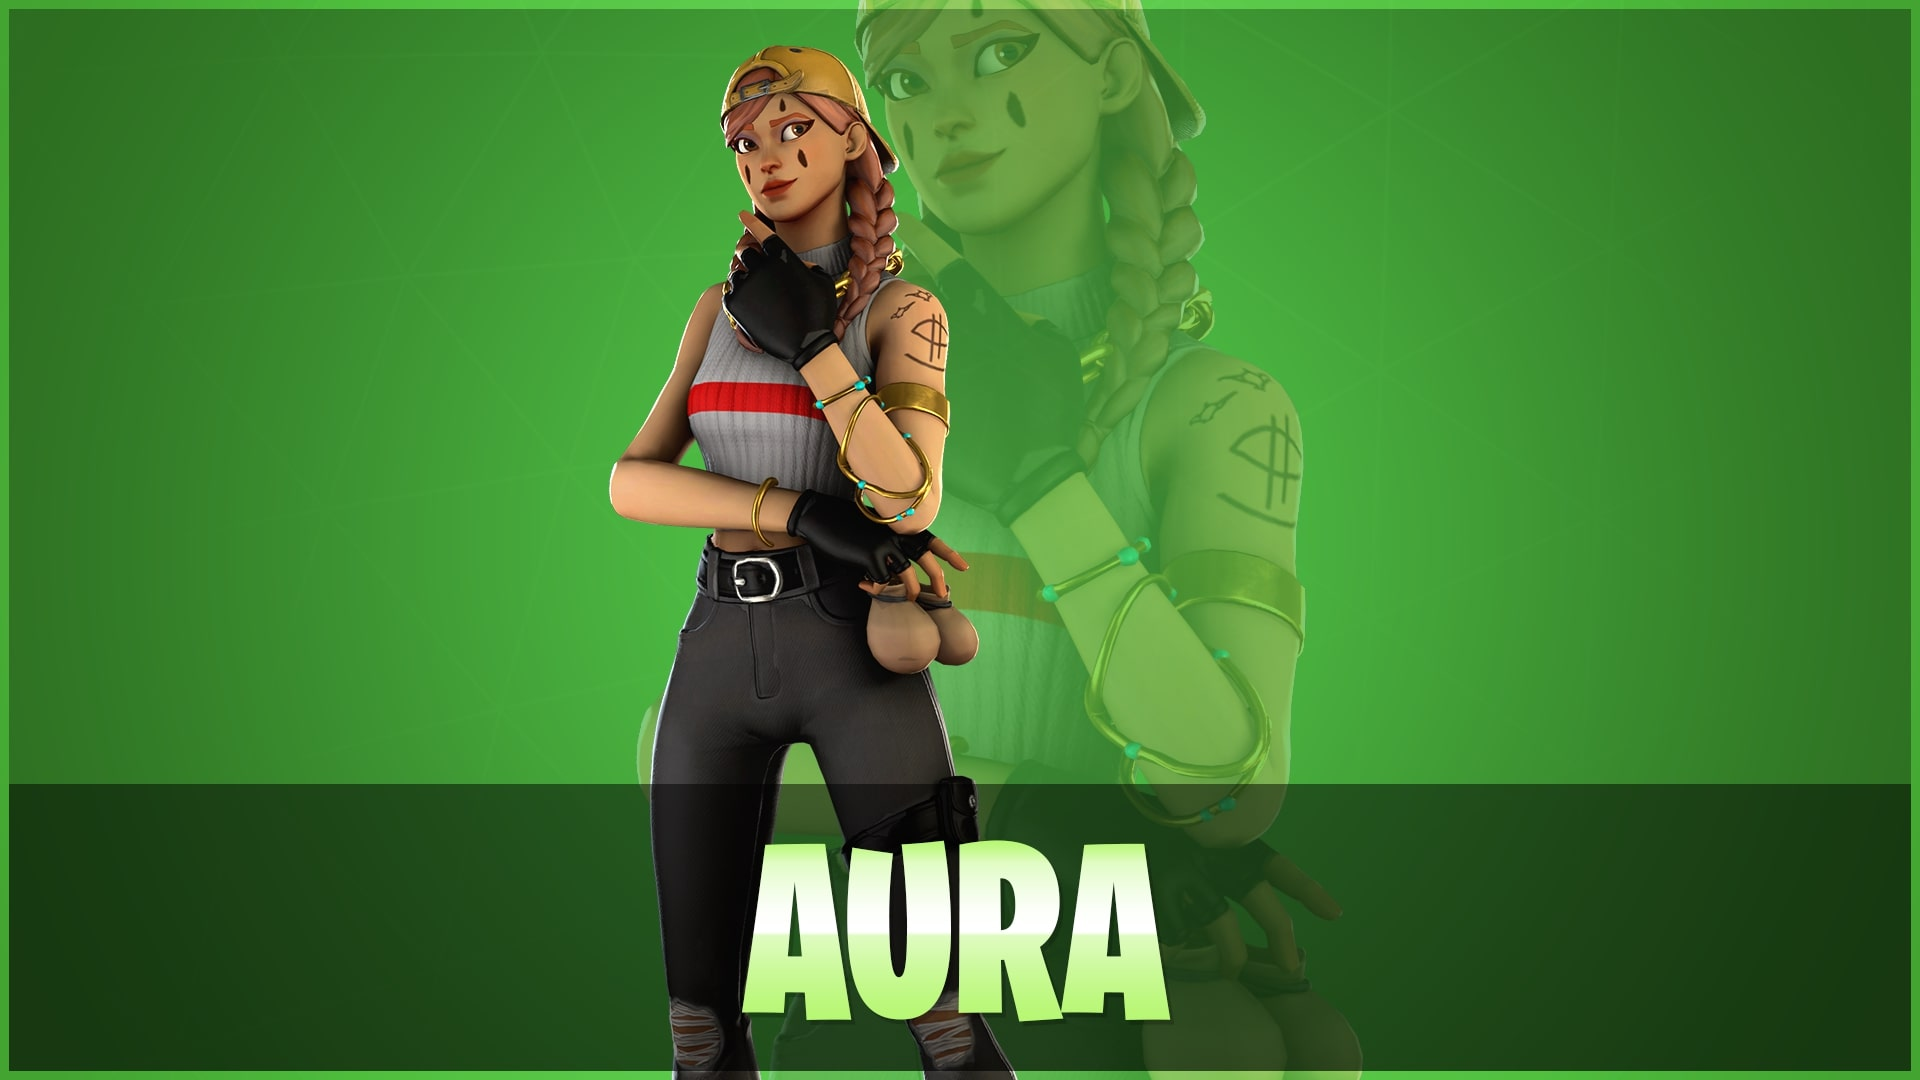 Aura Fortnite Wallpapers For All Fans Details Mega Themes